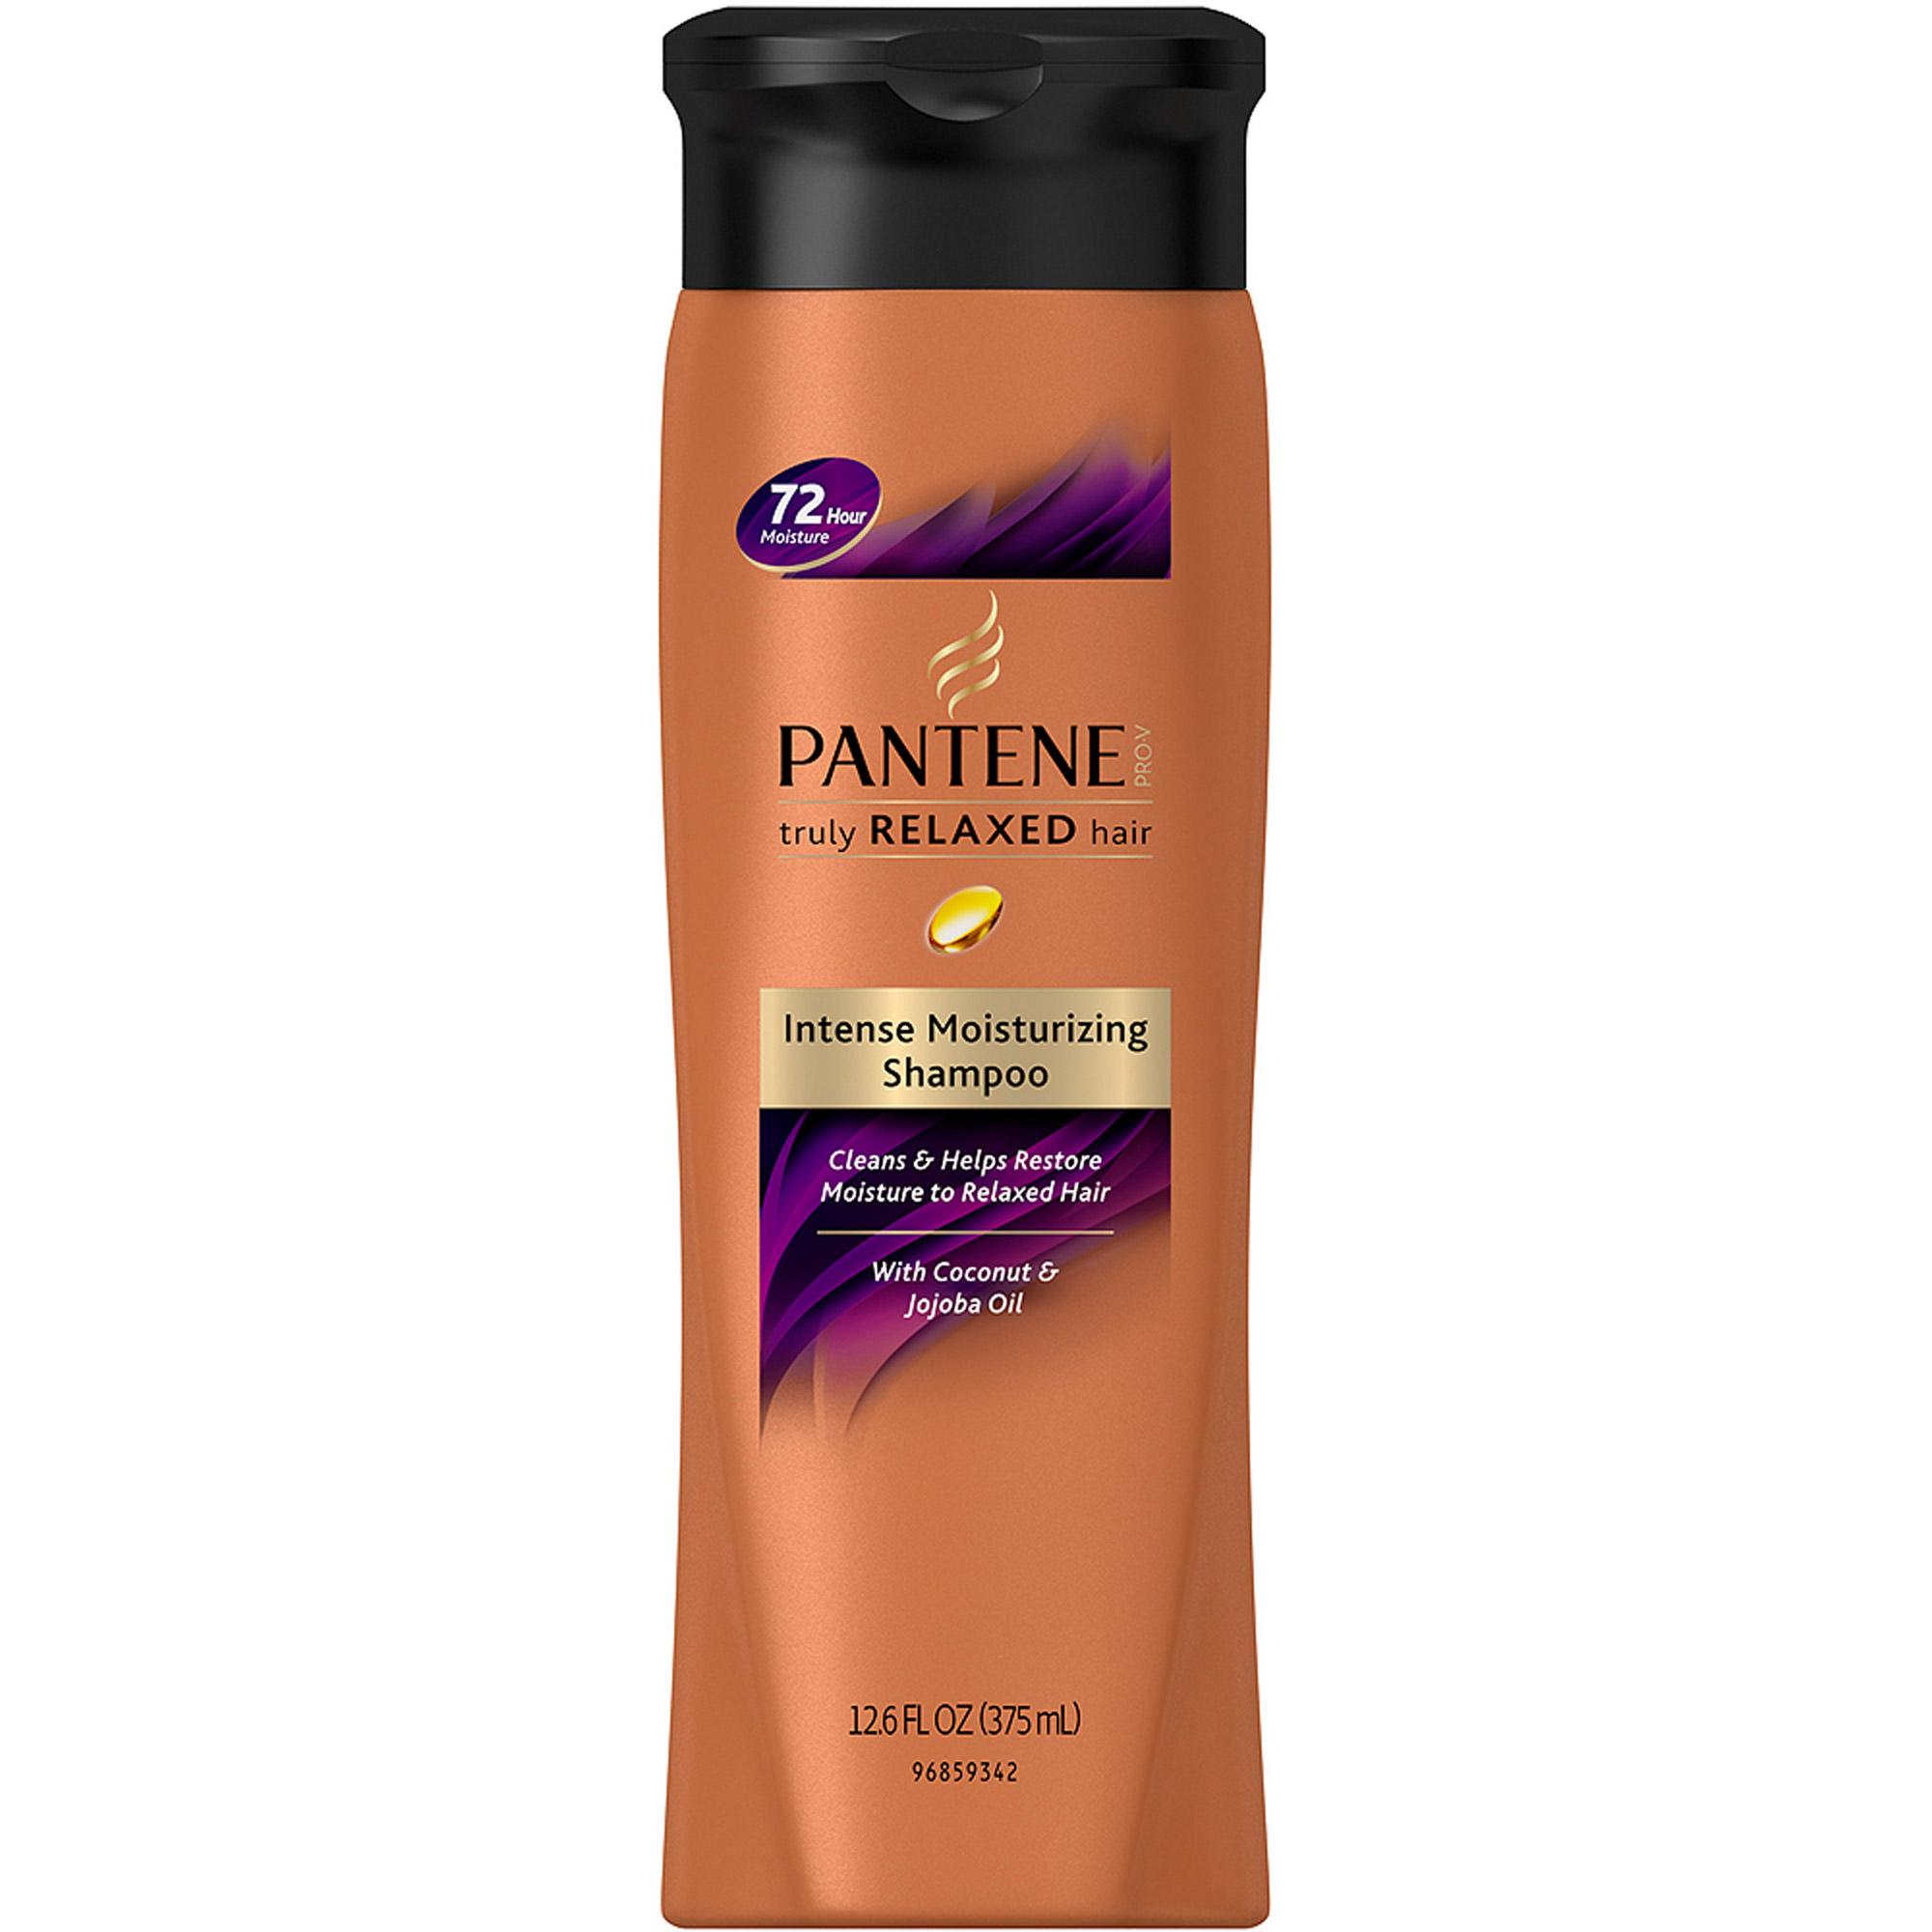 Pantene Pro-V Truly Relaxed Hair Intense Moisturizing Shampoo, 12.6 fl oz